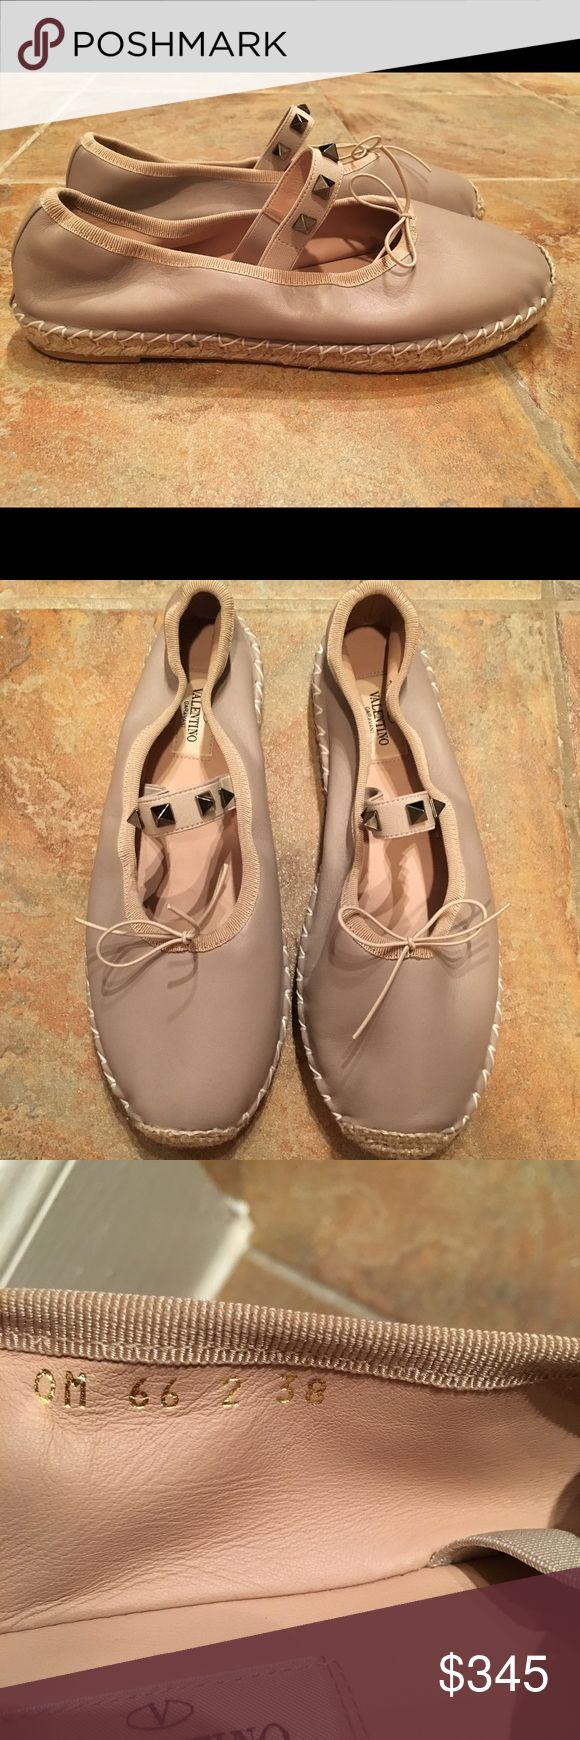 Valentino Rockstud Espadrille Ballet Flat Nude 7.5 Valentino Rockstud Espadrille Ballet Flat Nude $550  Size 7.5 US Valentino Shoes Espadrilles